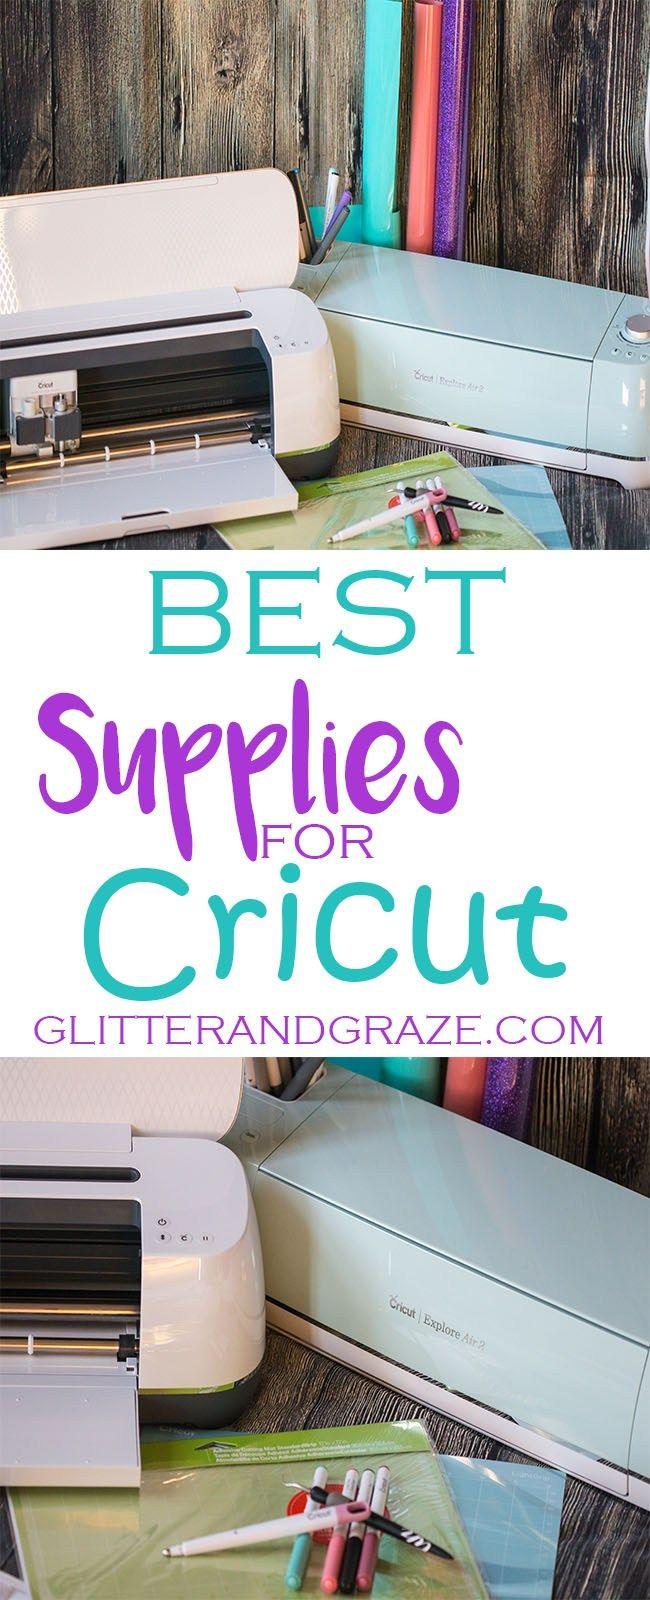 best supplies for cricut | Cricut project ideas | Cricut